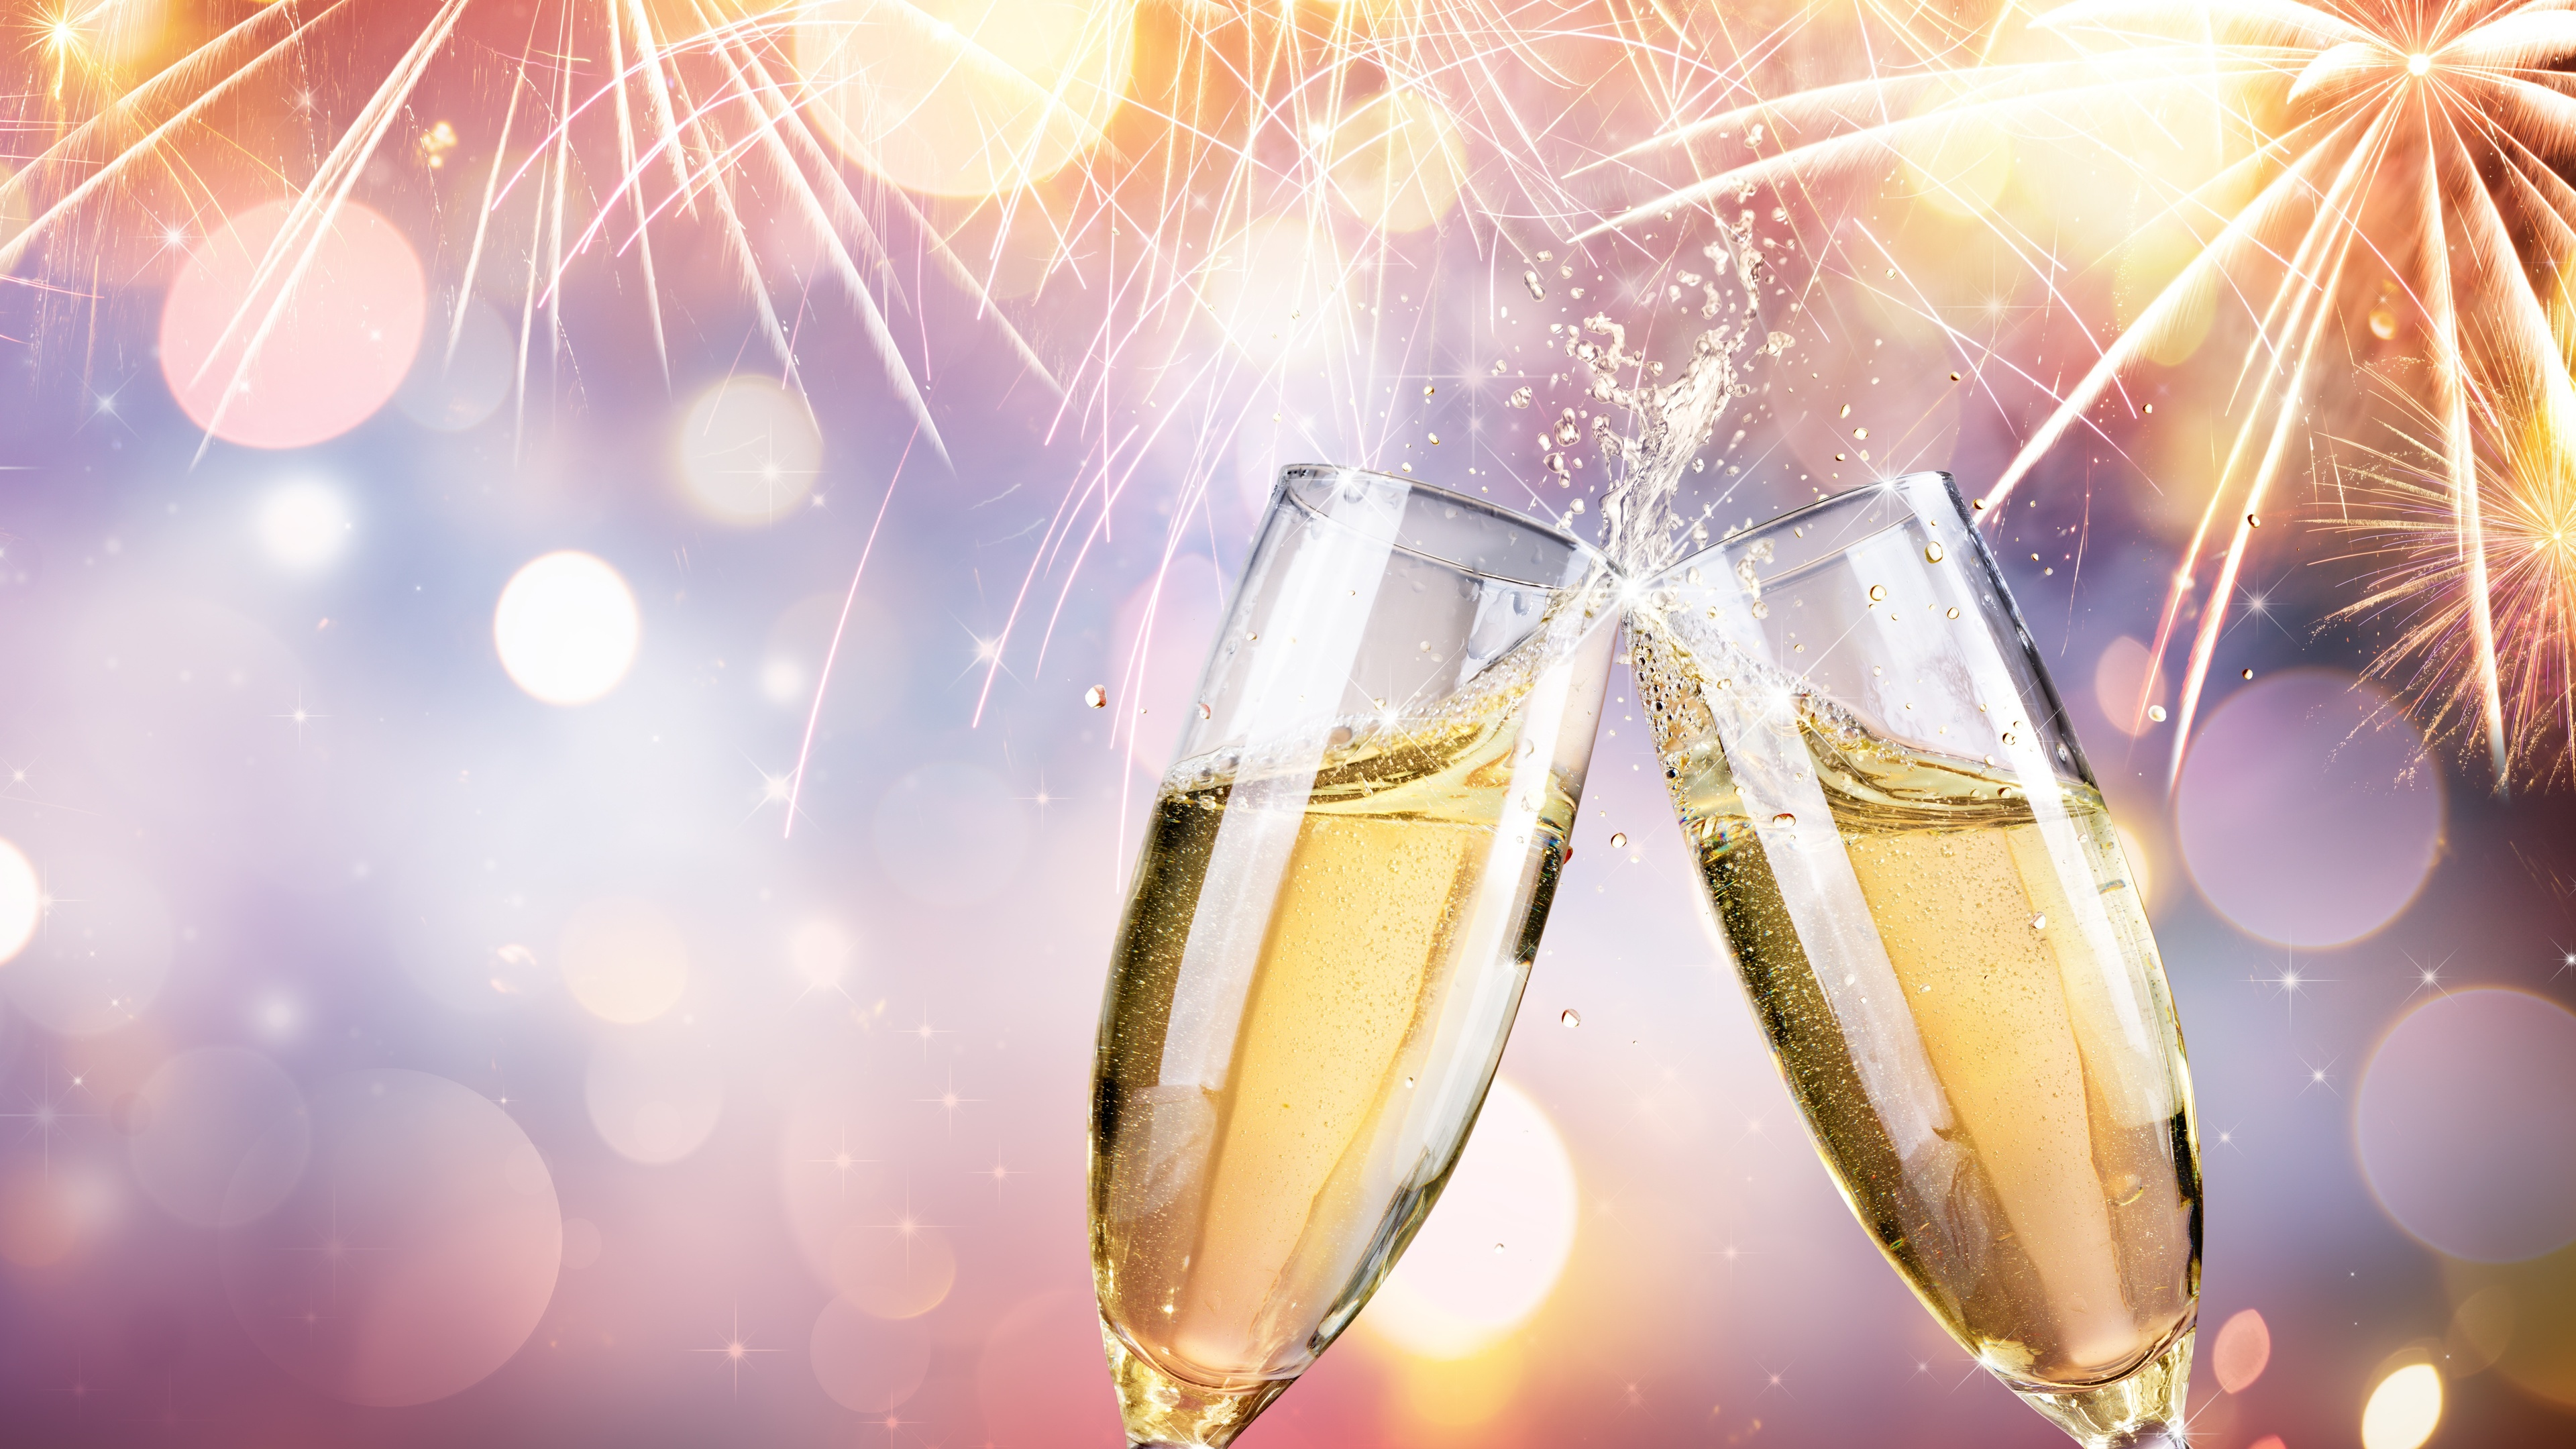 celebration champagne fireworks 4k 1543946535 - Celebration Champagne Fireworks 4k - hd-wallpapers, fireworks wallpapers, champagne wallpapers, celebrations wallpapers, 5k wallpapers, 4k-wallpapers